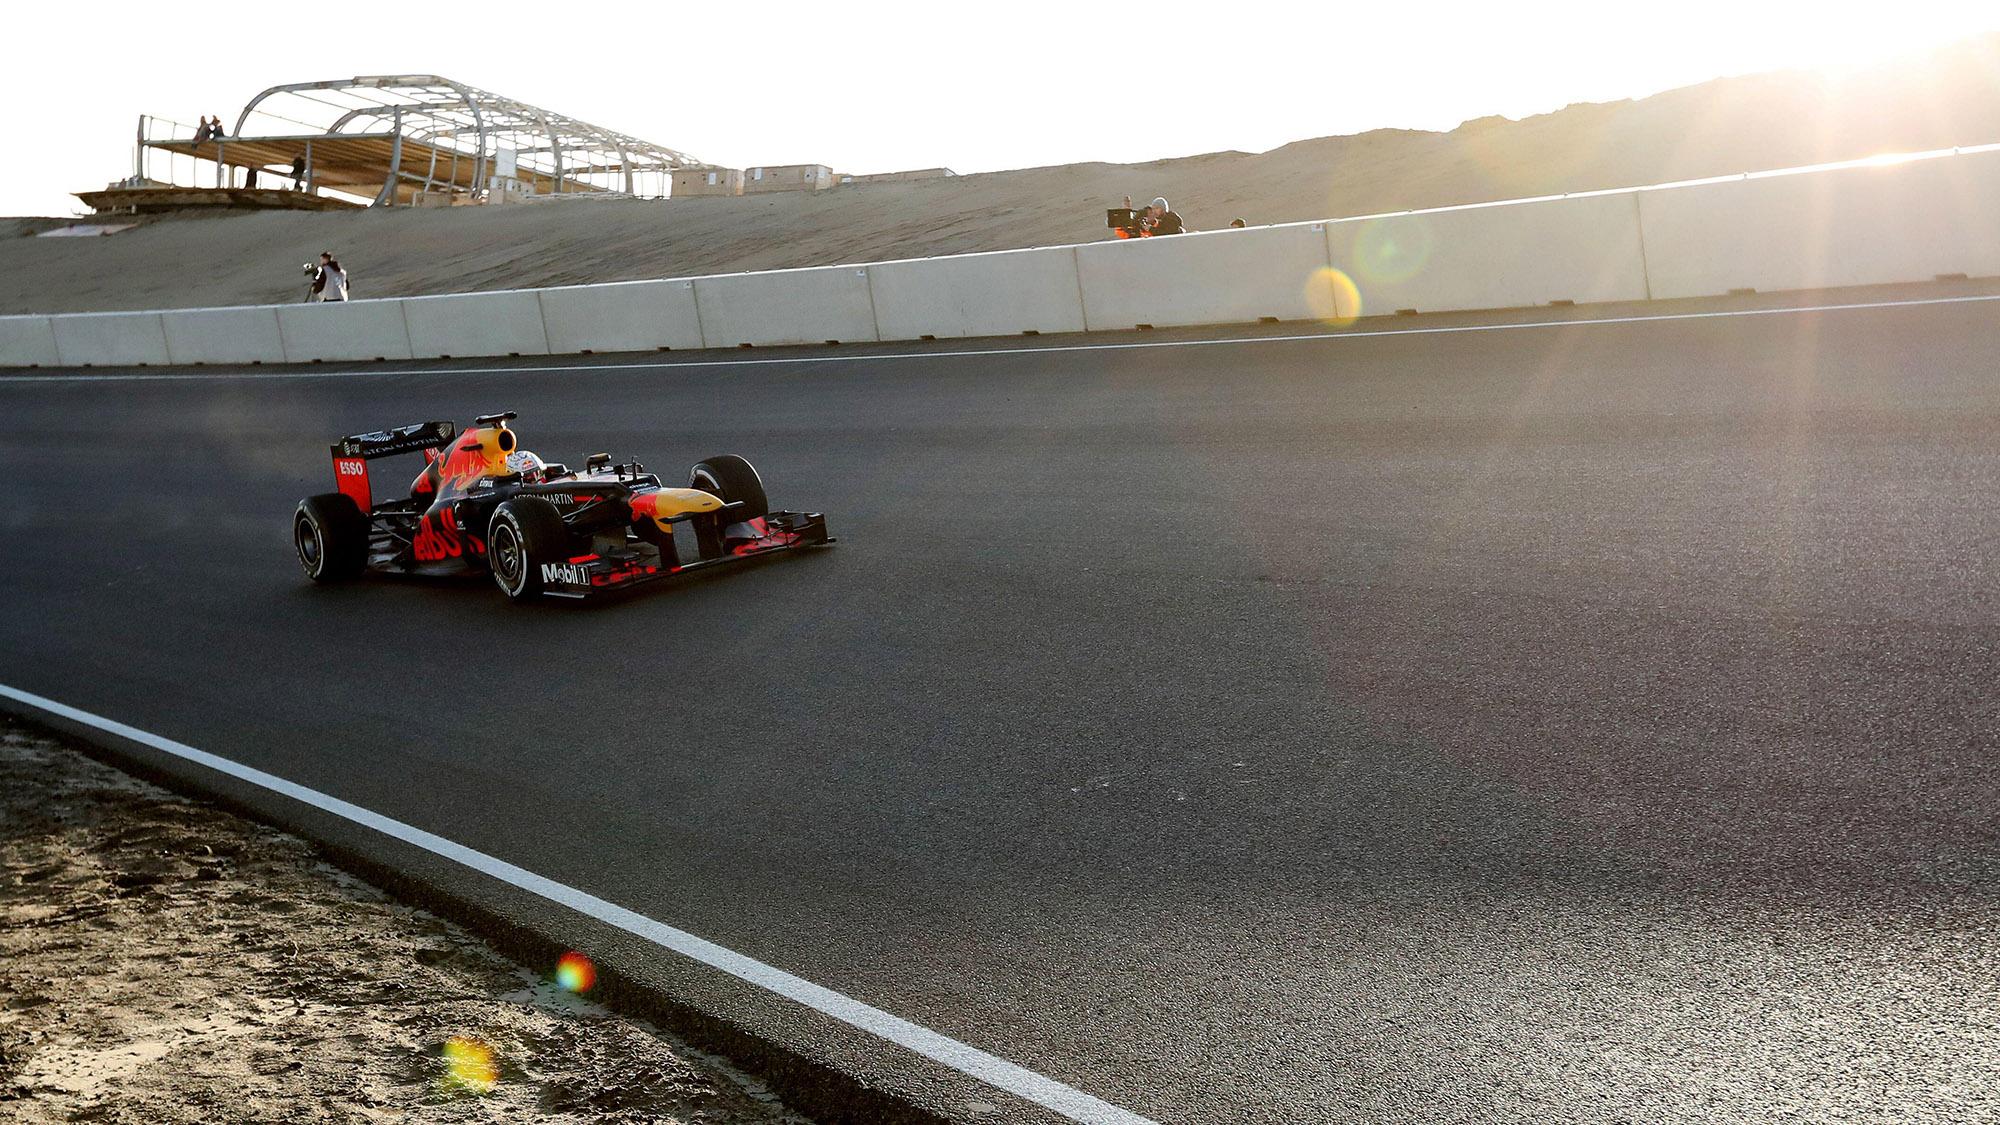 Max Verstappen on banked corner at Zandvoort